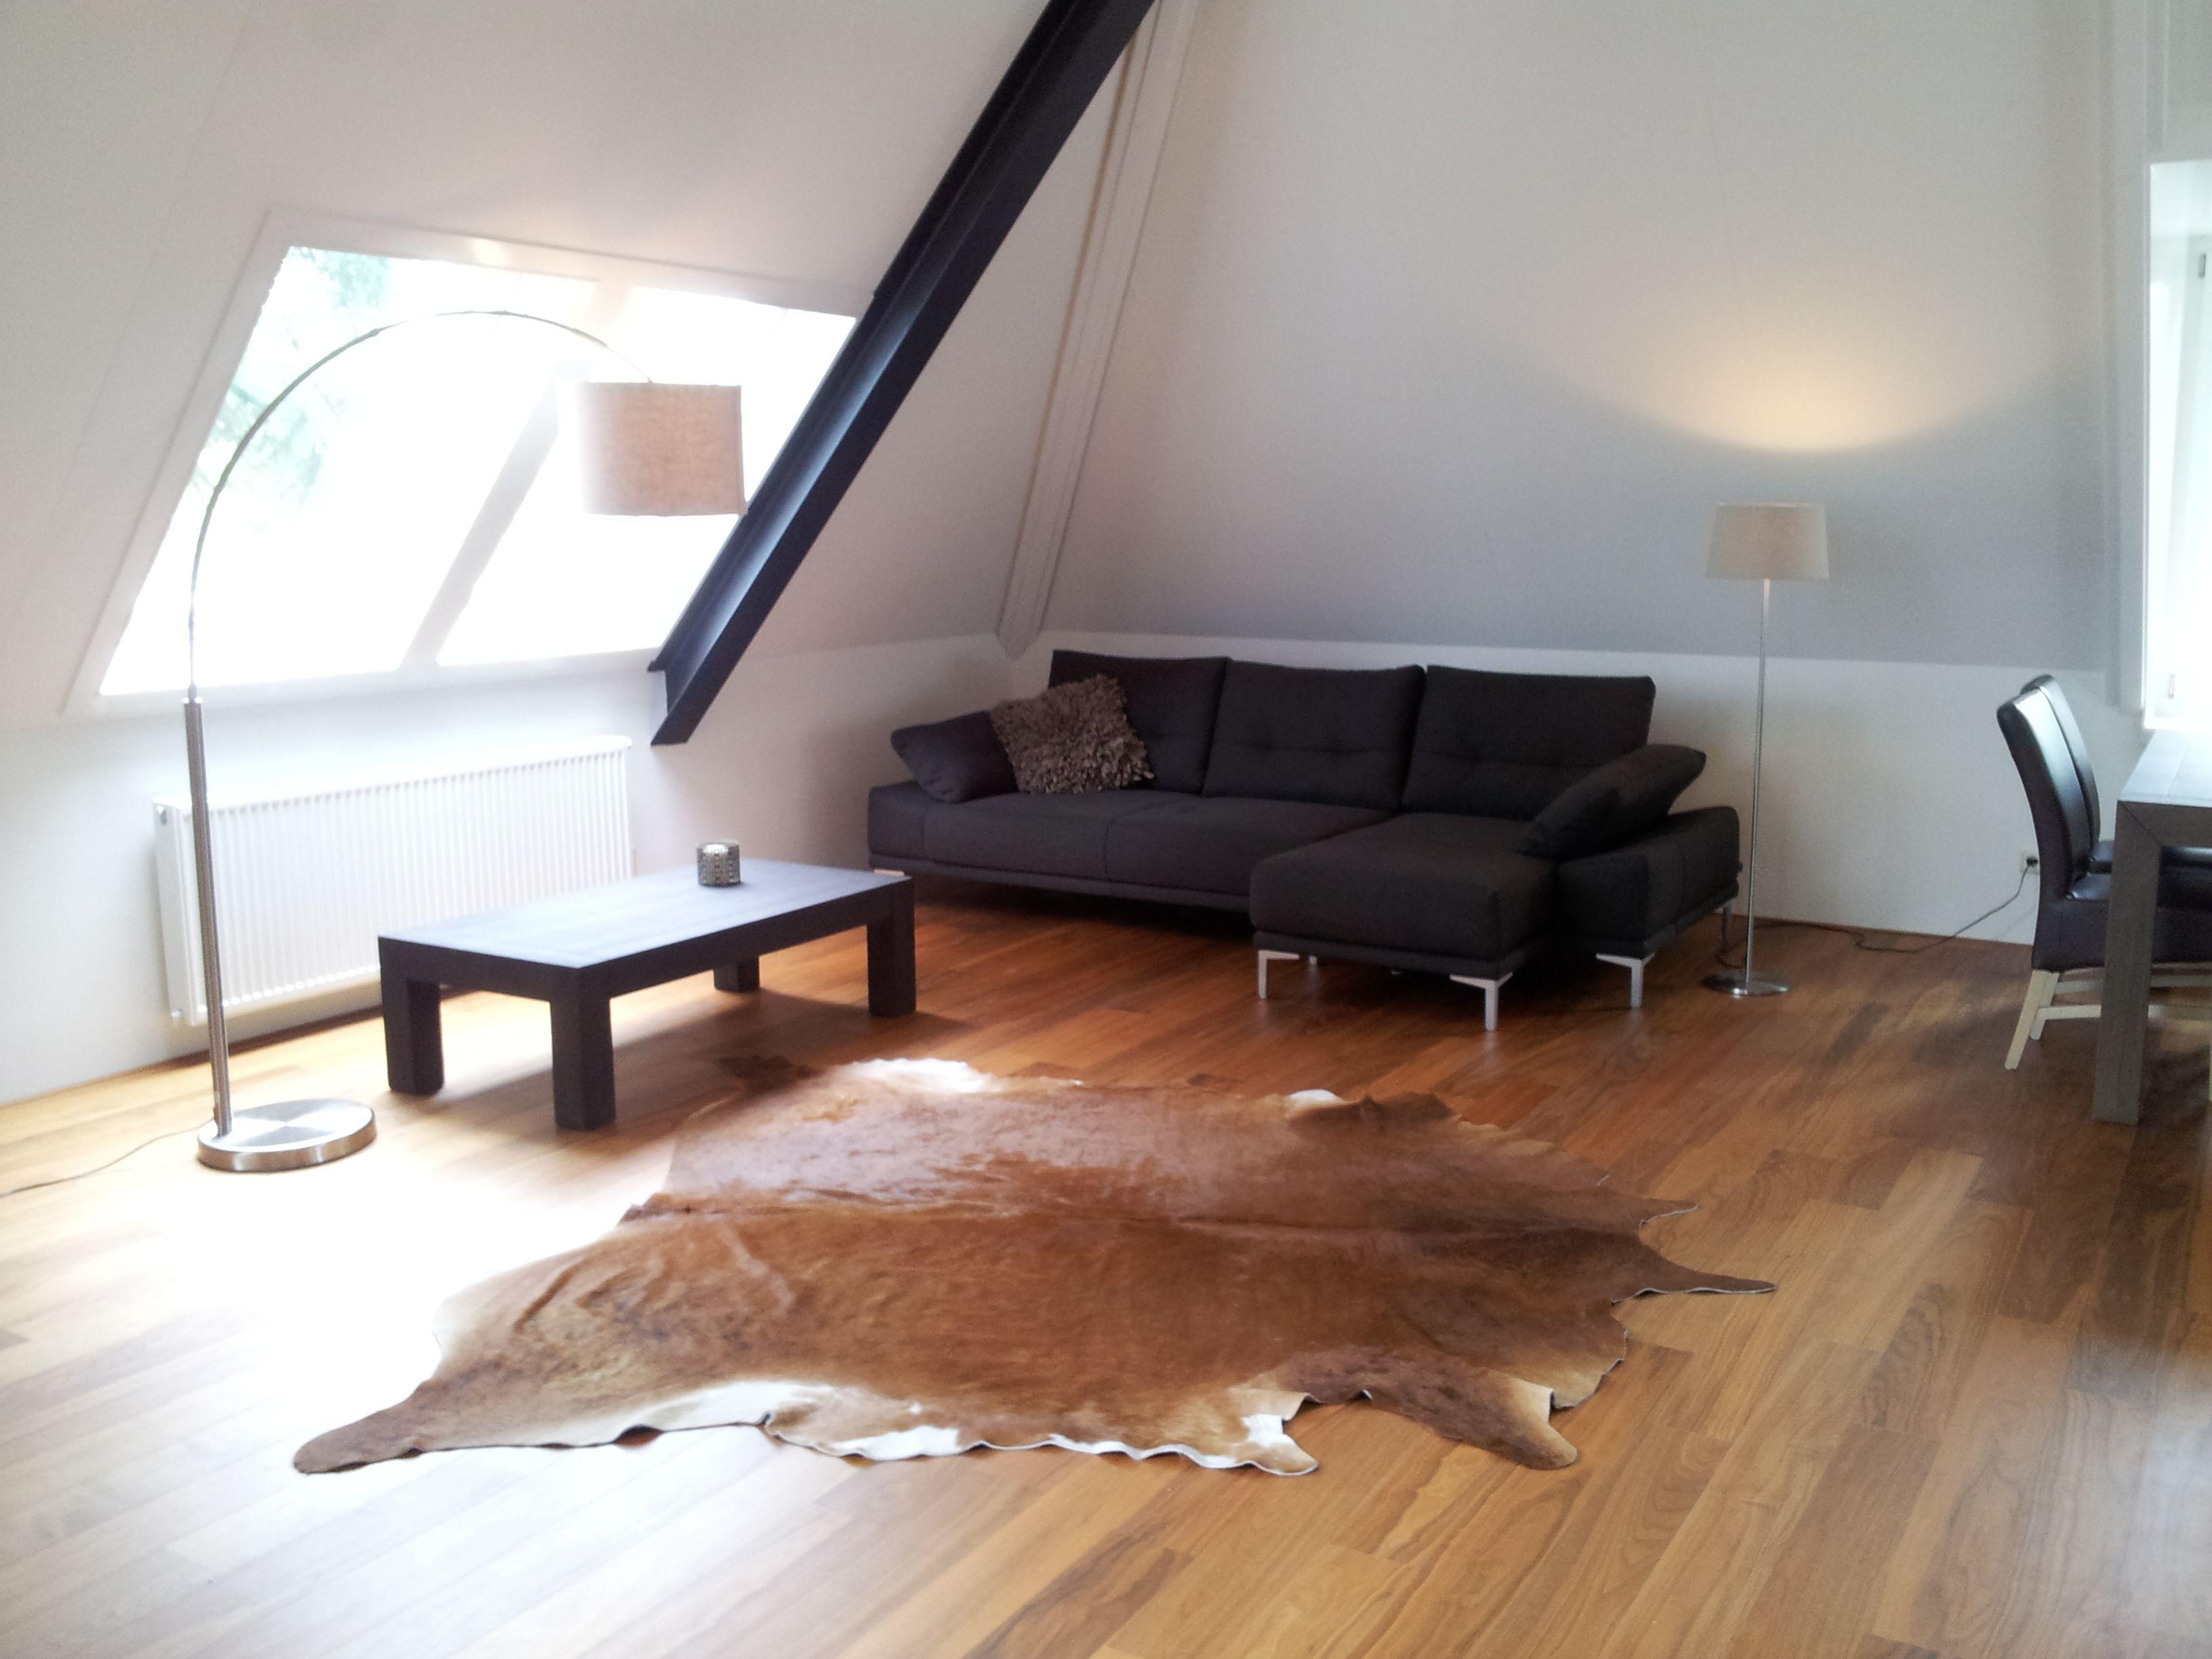 Meubel verhuur. Interieur verhuur. Expat housing. Holland ...